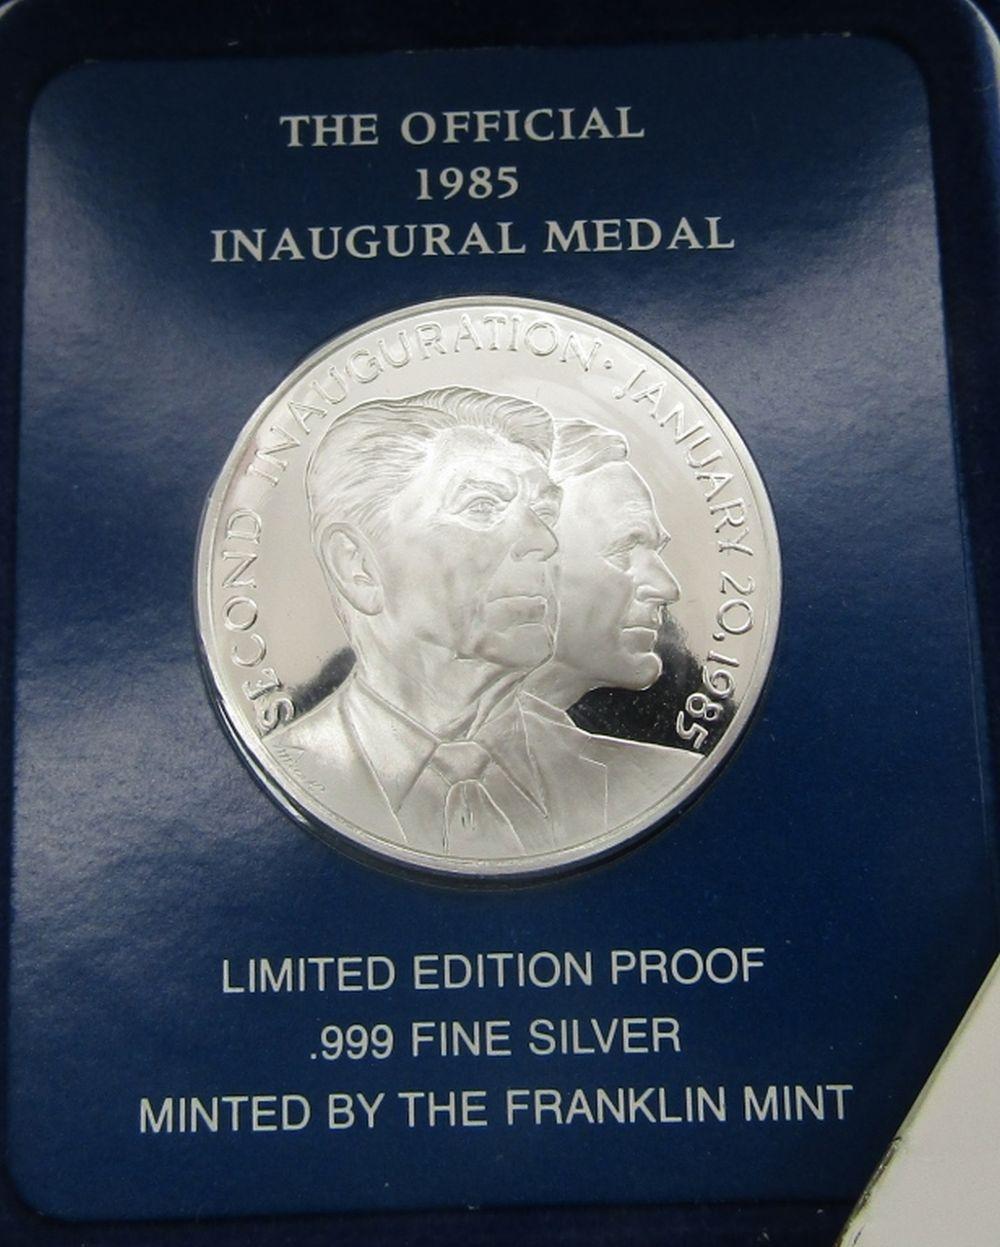 1985 INAUGURAL MEDAL .999 SILVER